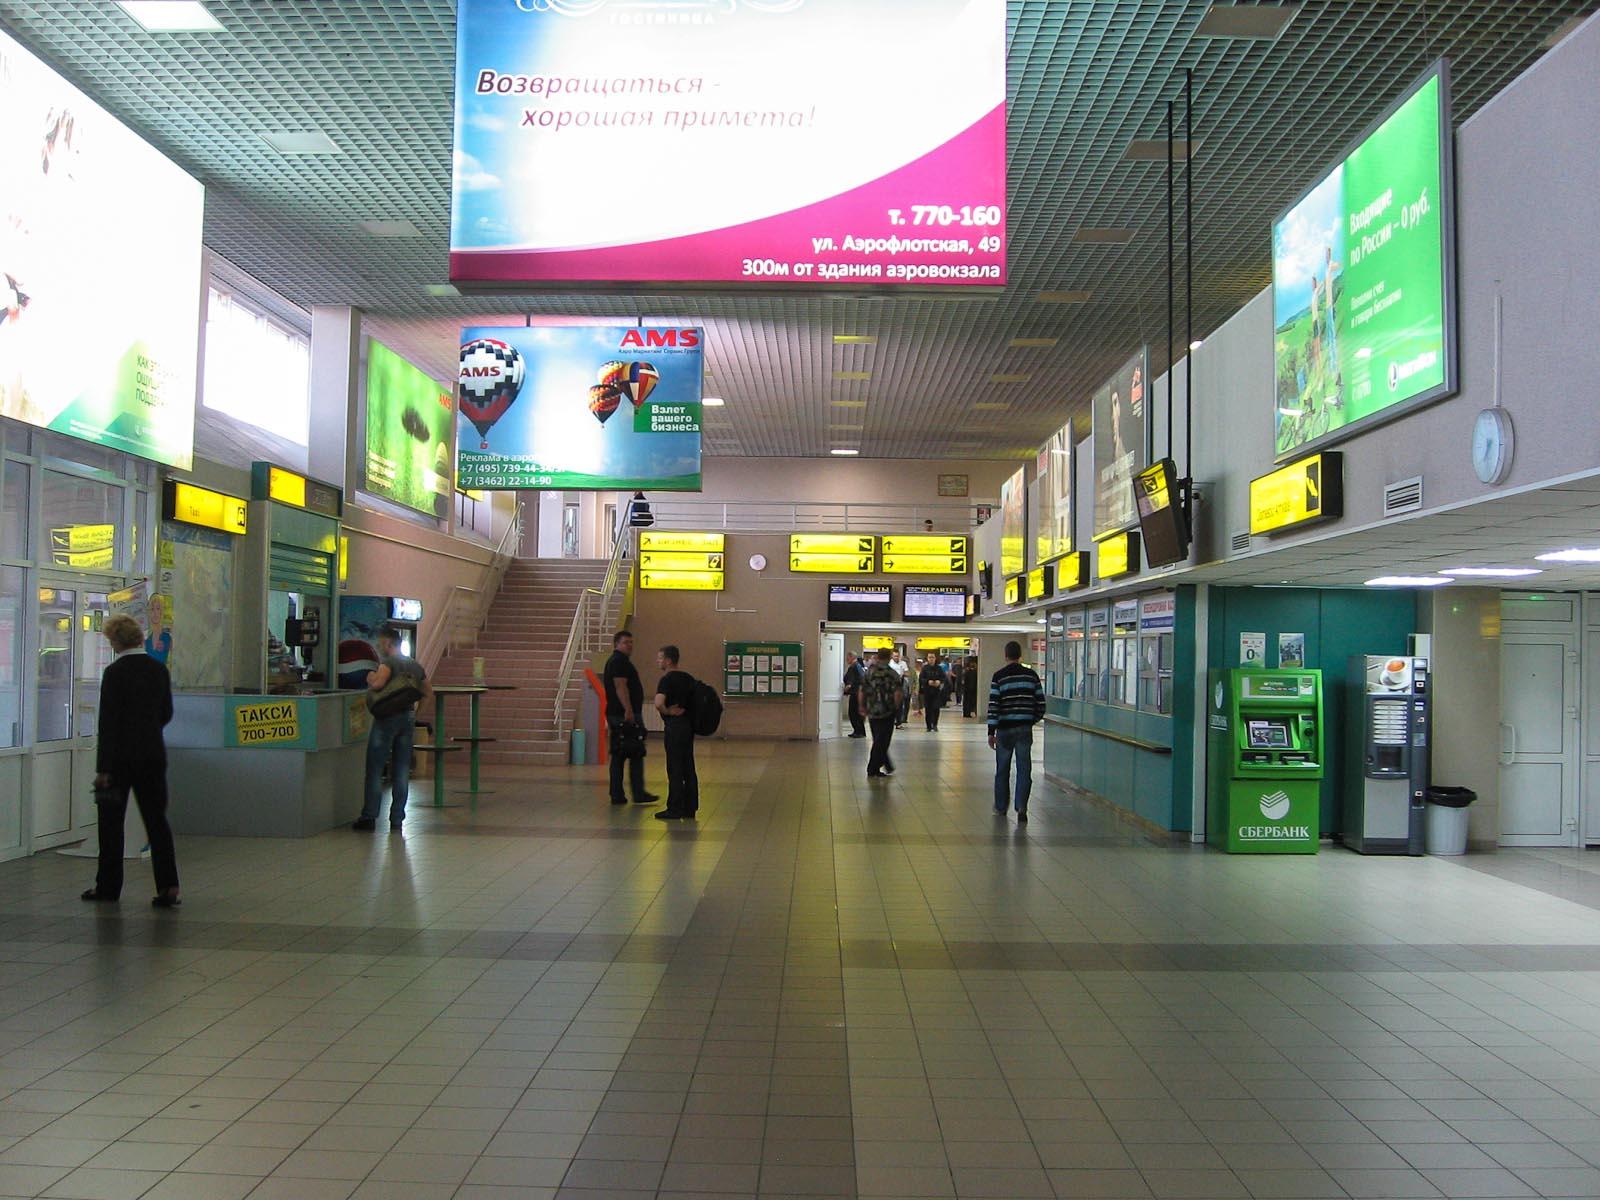 Зал прилета в аэропорту Сургут